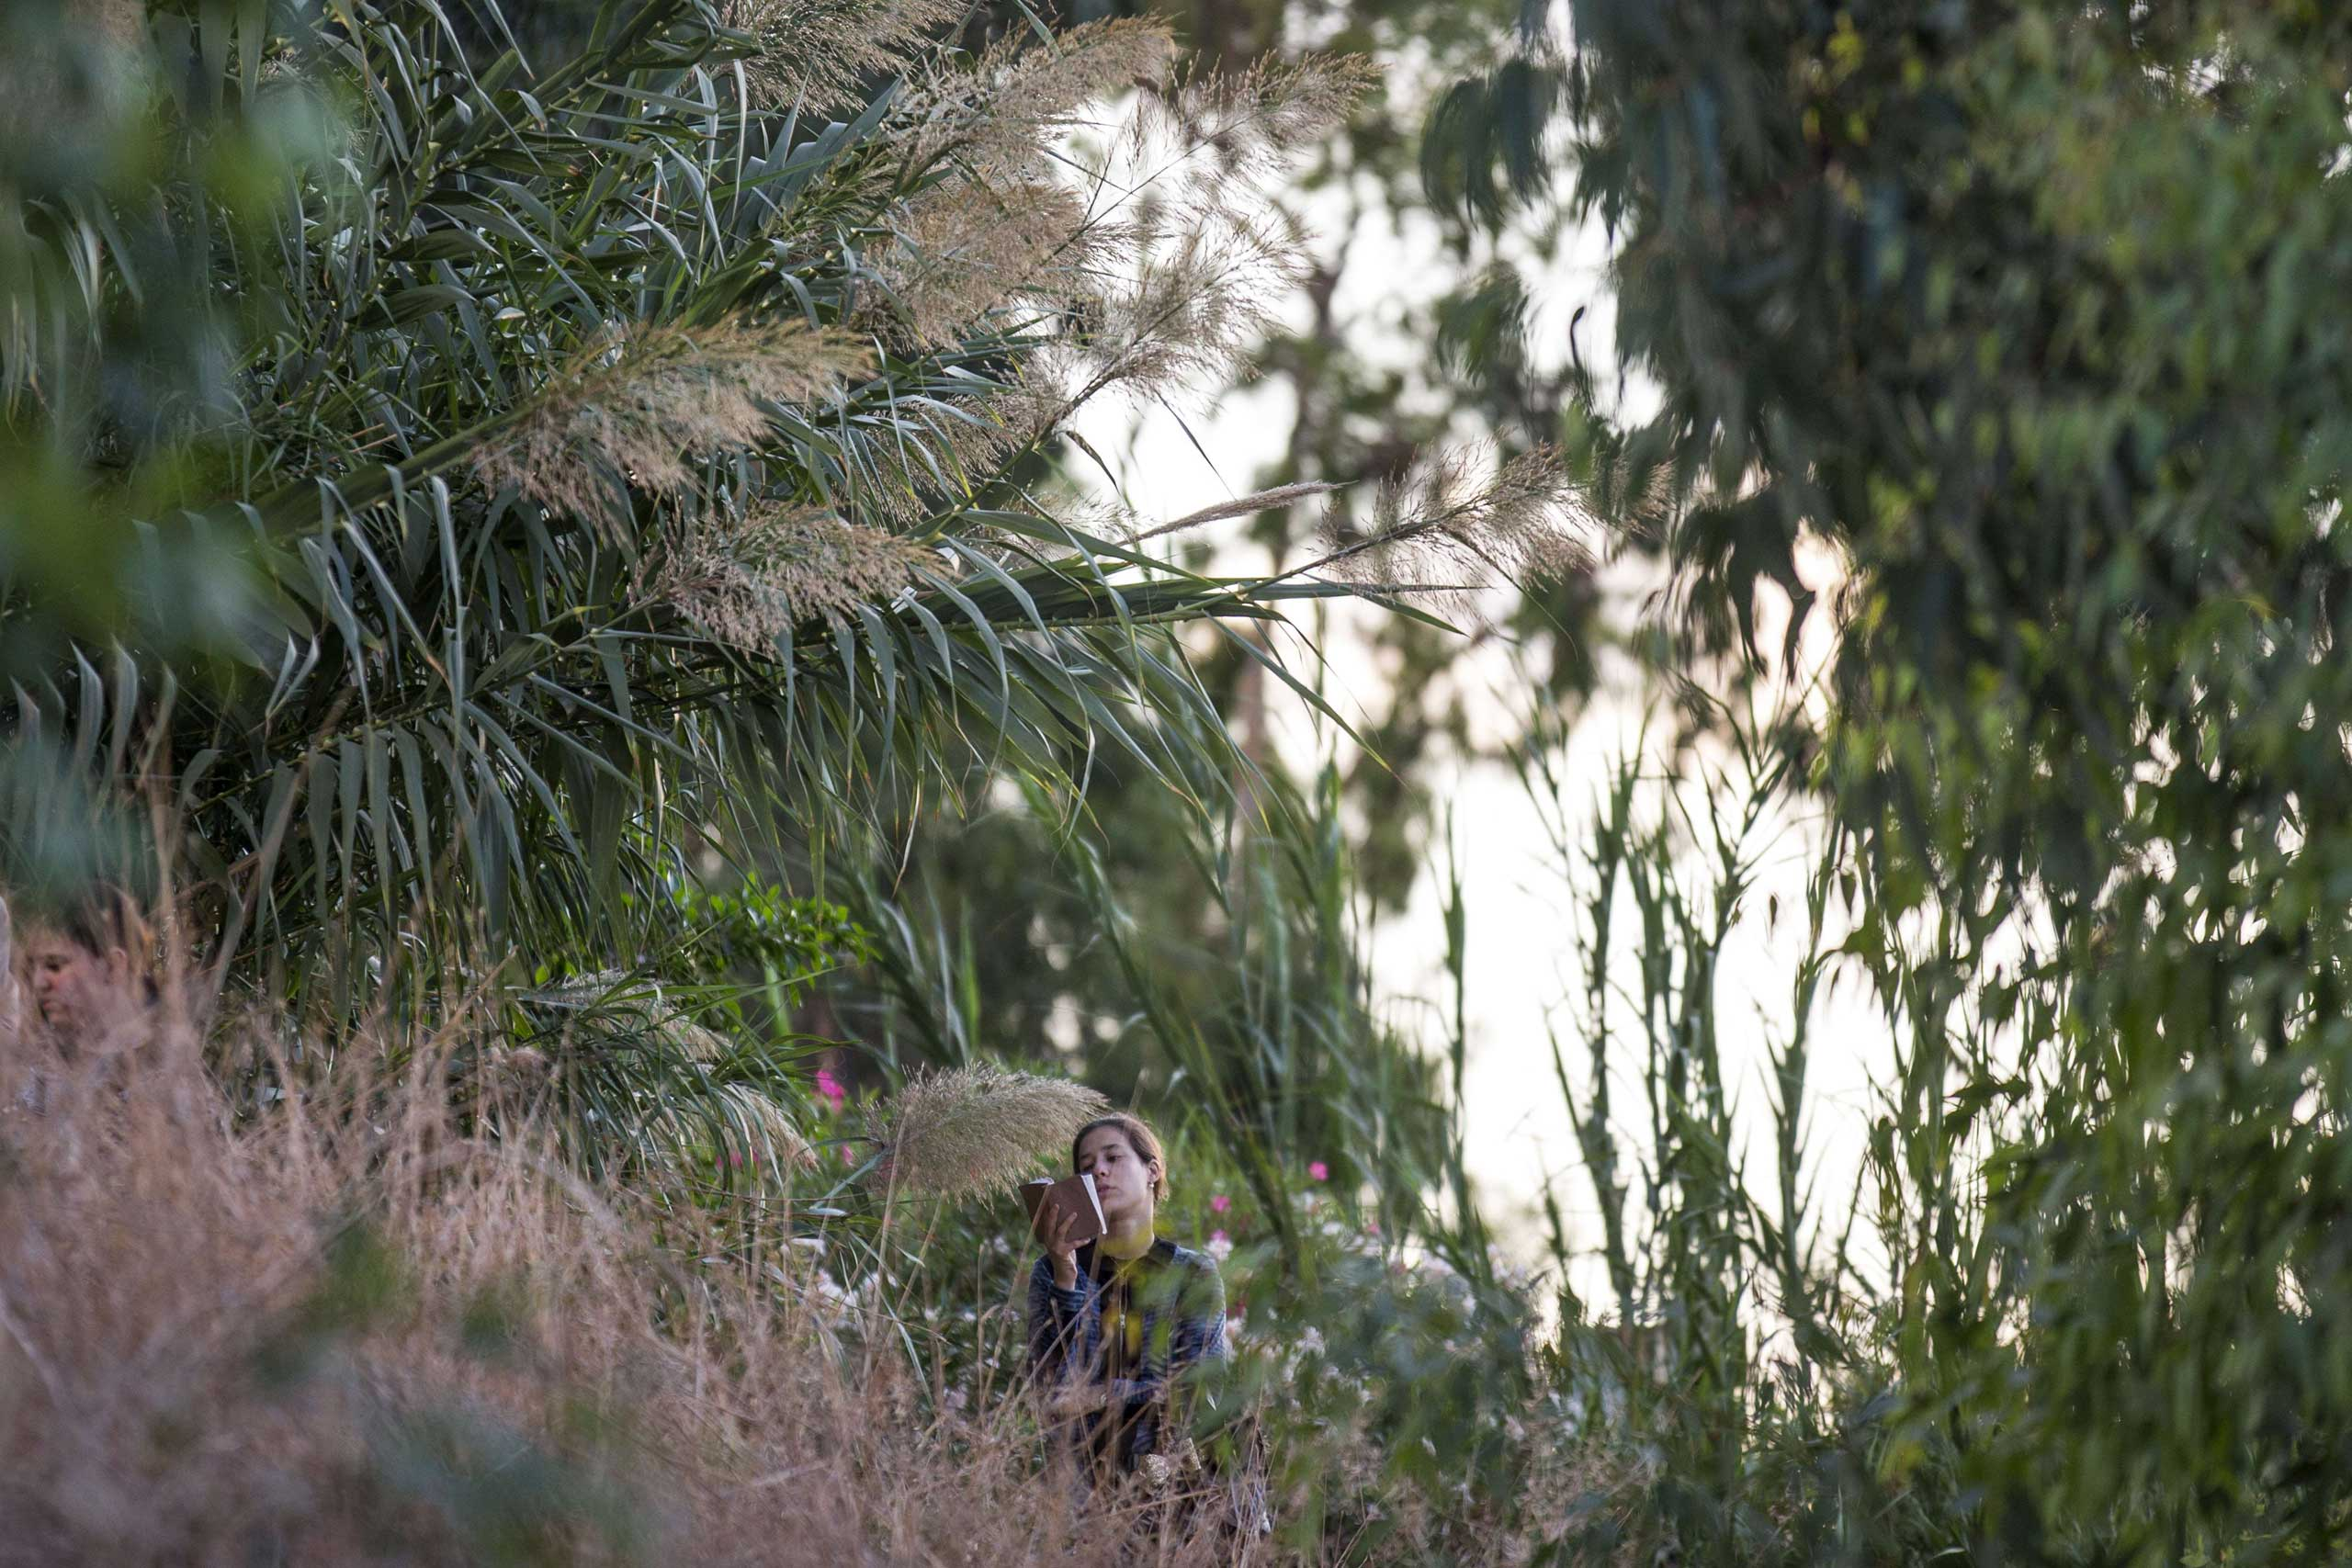 Oct. 2, 2014. An Ultra-Orthodox Jewish girl prays along the Ayarkon River in the city of Ramat Gan near Tel Aviv during the ritual of  Tashlich , the day before Yom Kippur.